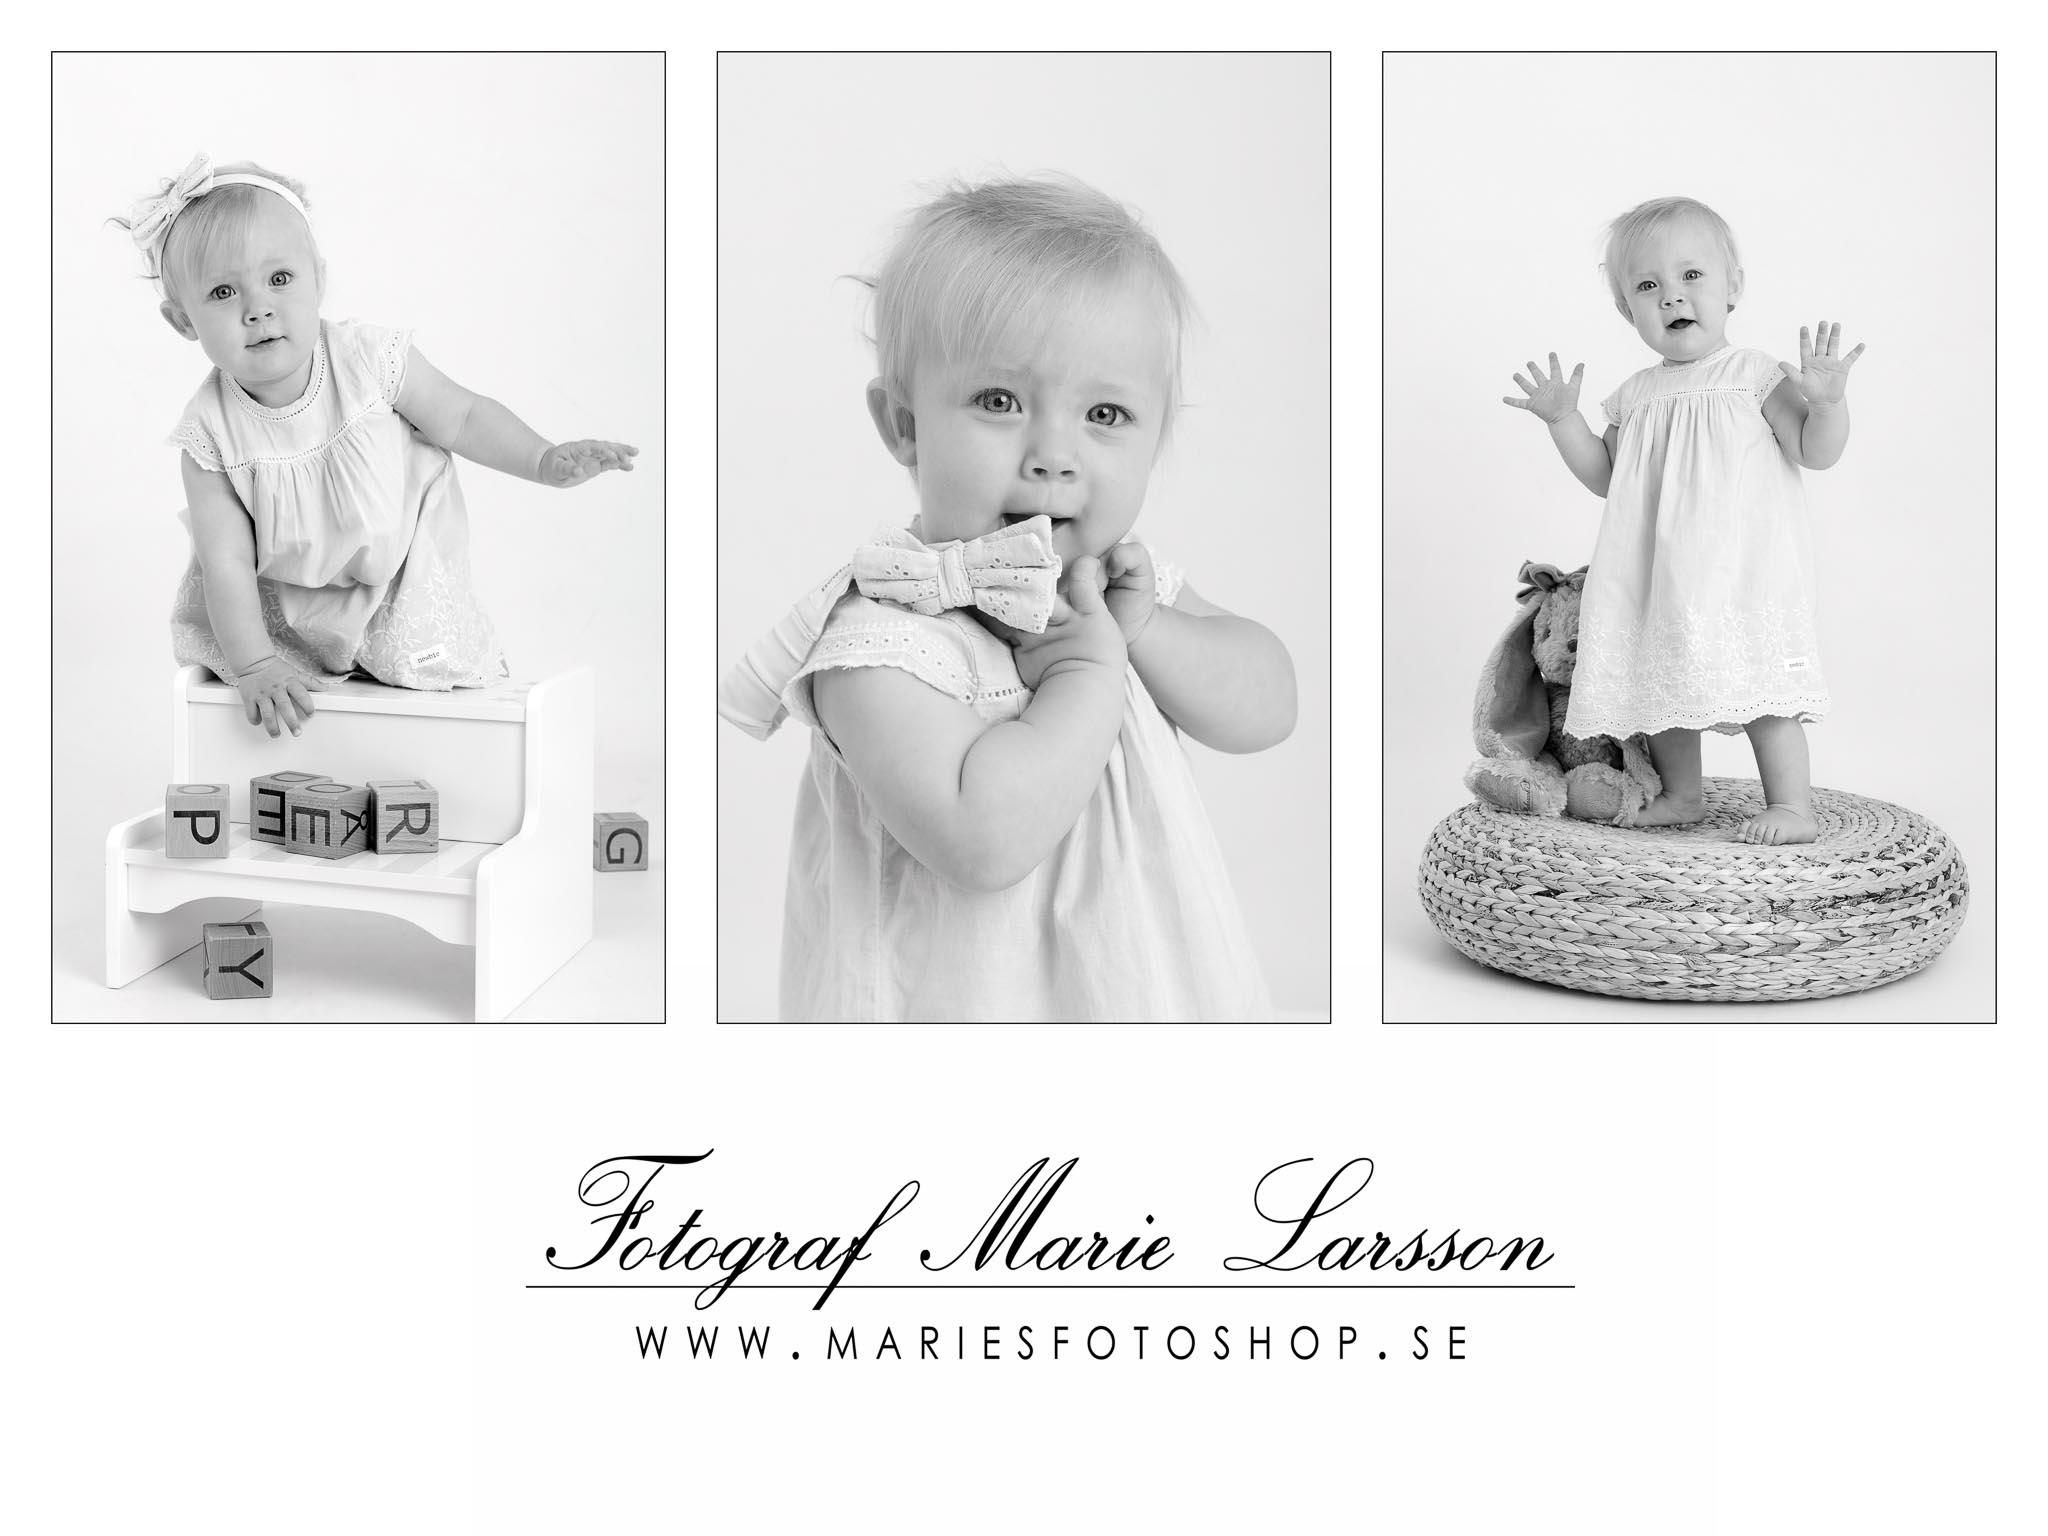 Barnfotografering, Fotograf, Barnfotograf, Stenungsund, Kungälv, Uddevalla, Tjörn , Orust, Göteborg